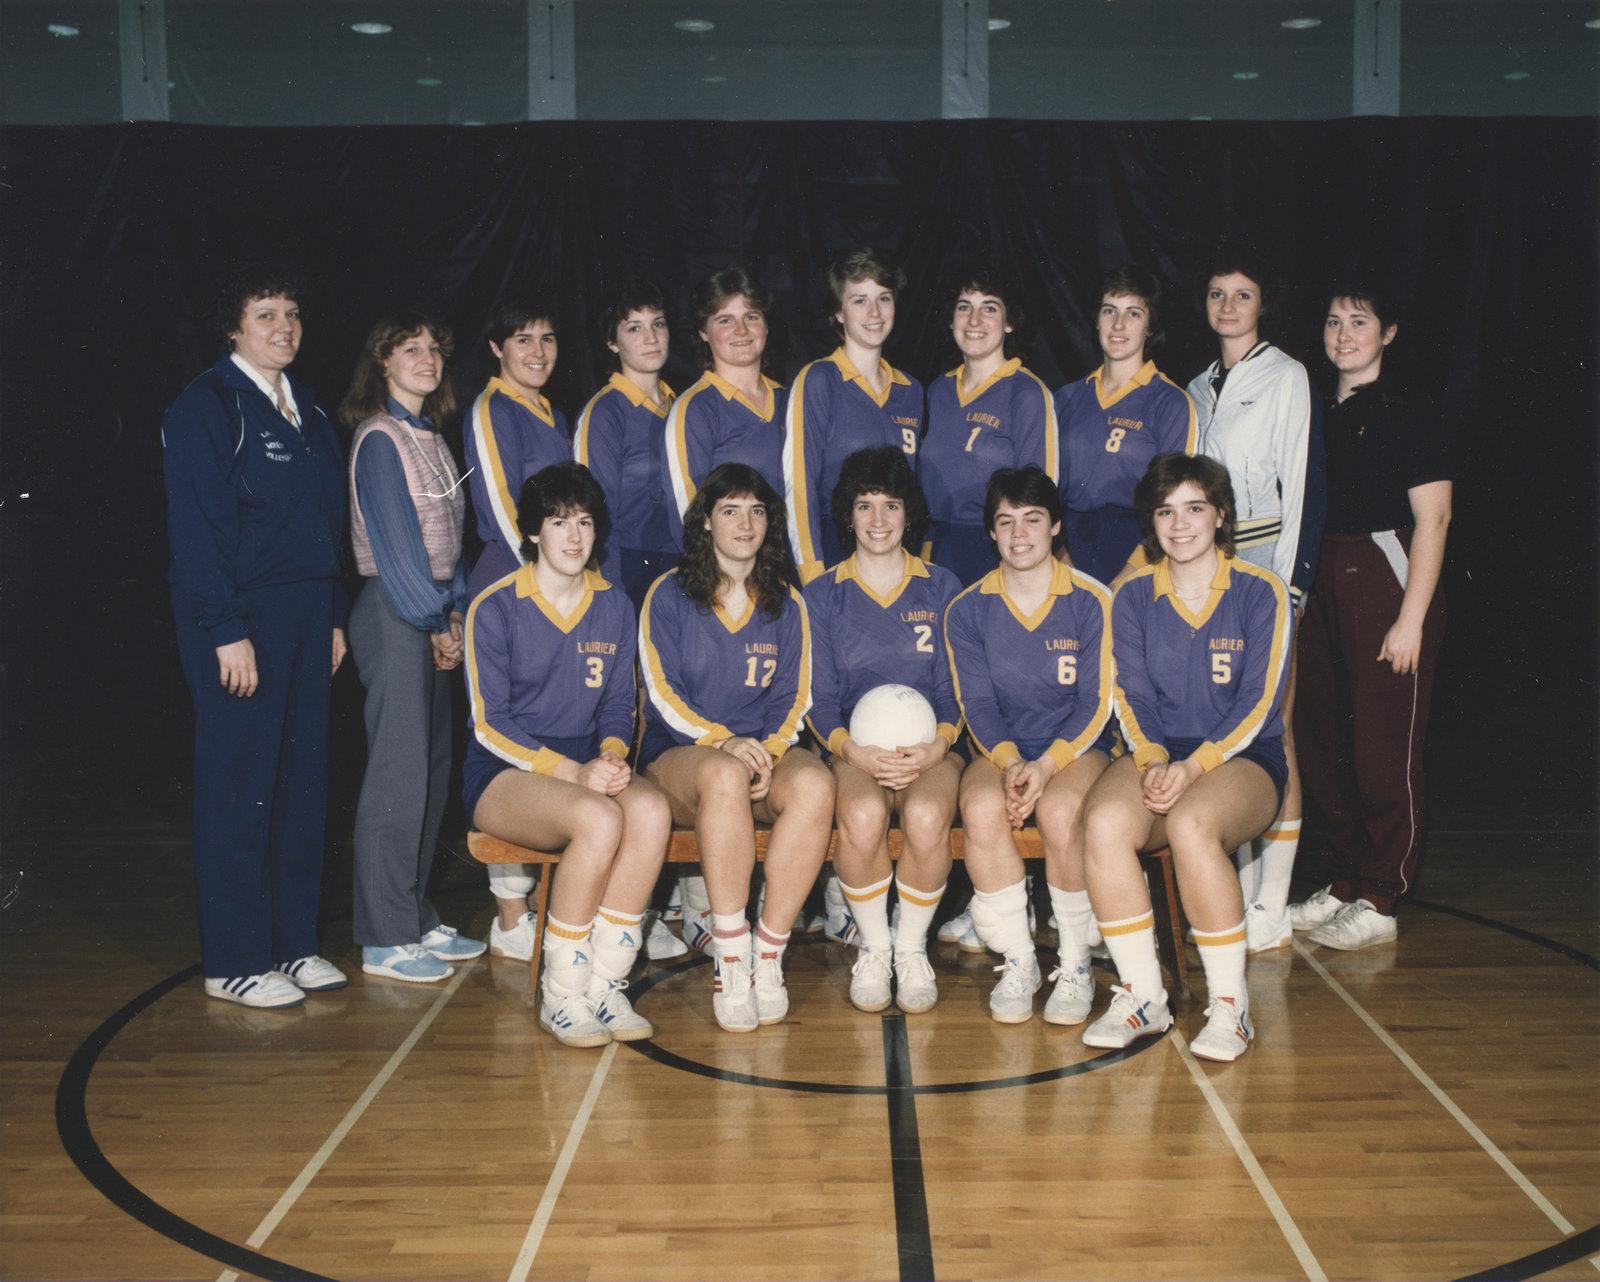 Wilfrid Laurier University women's volleyball team, 1984-85